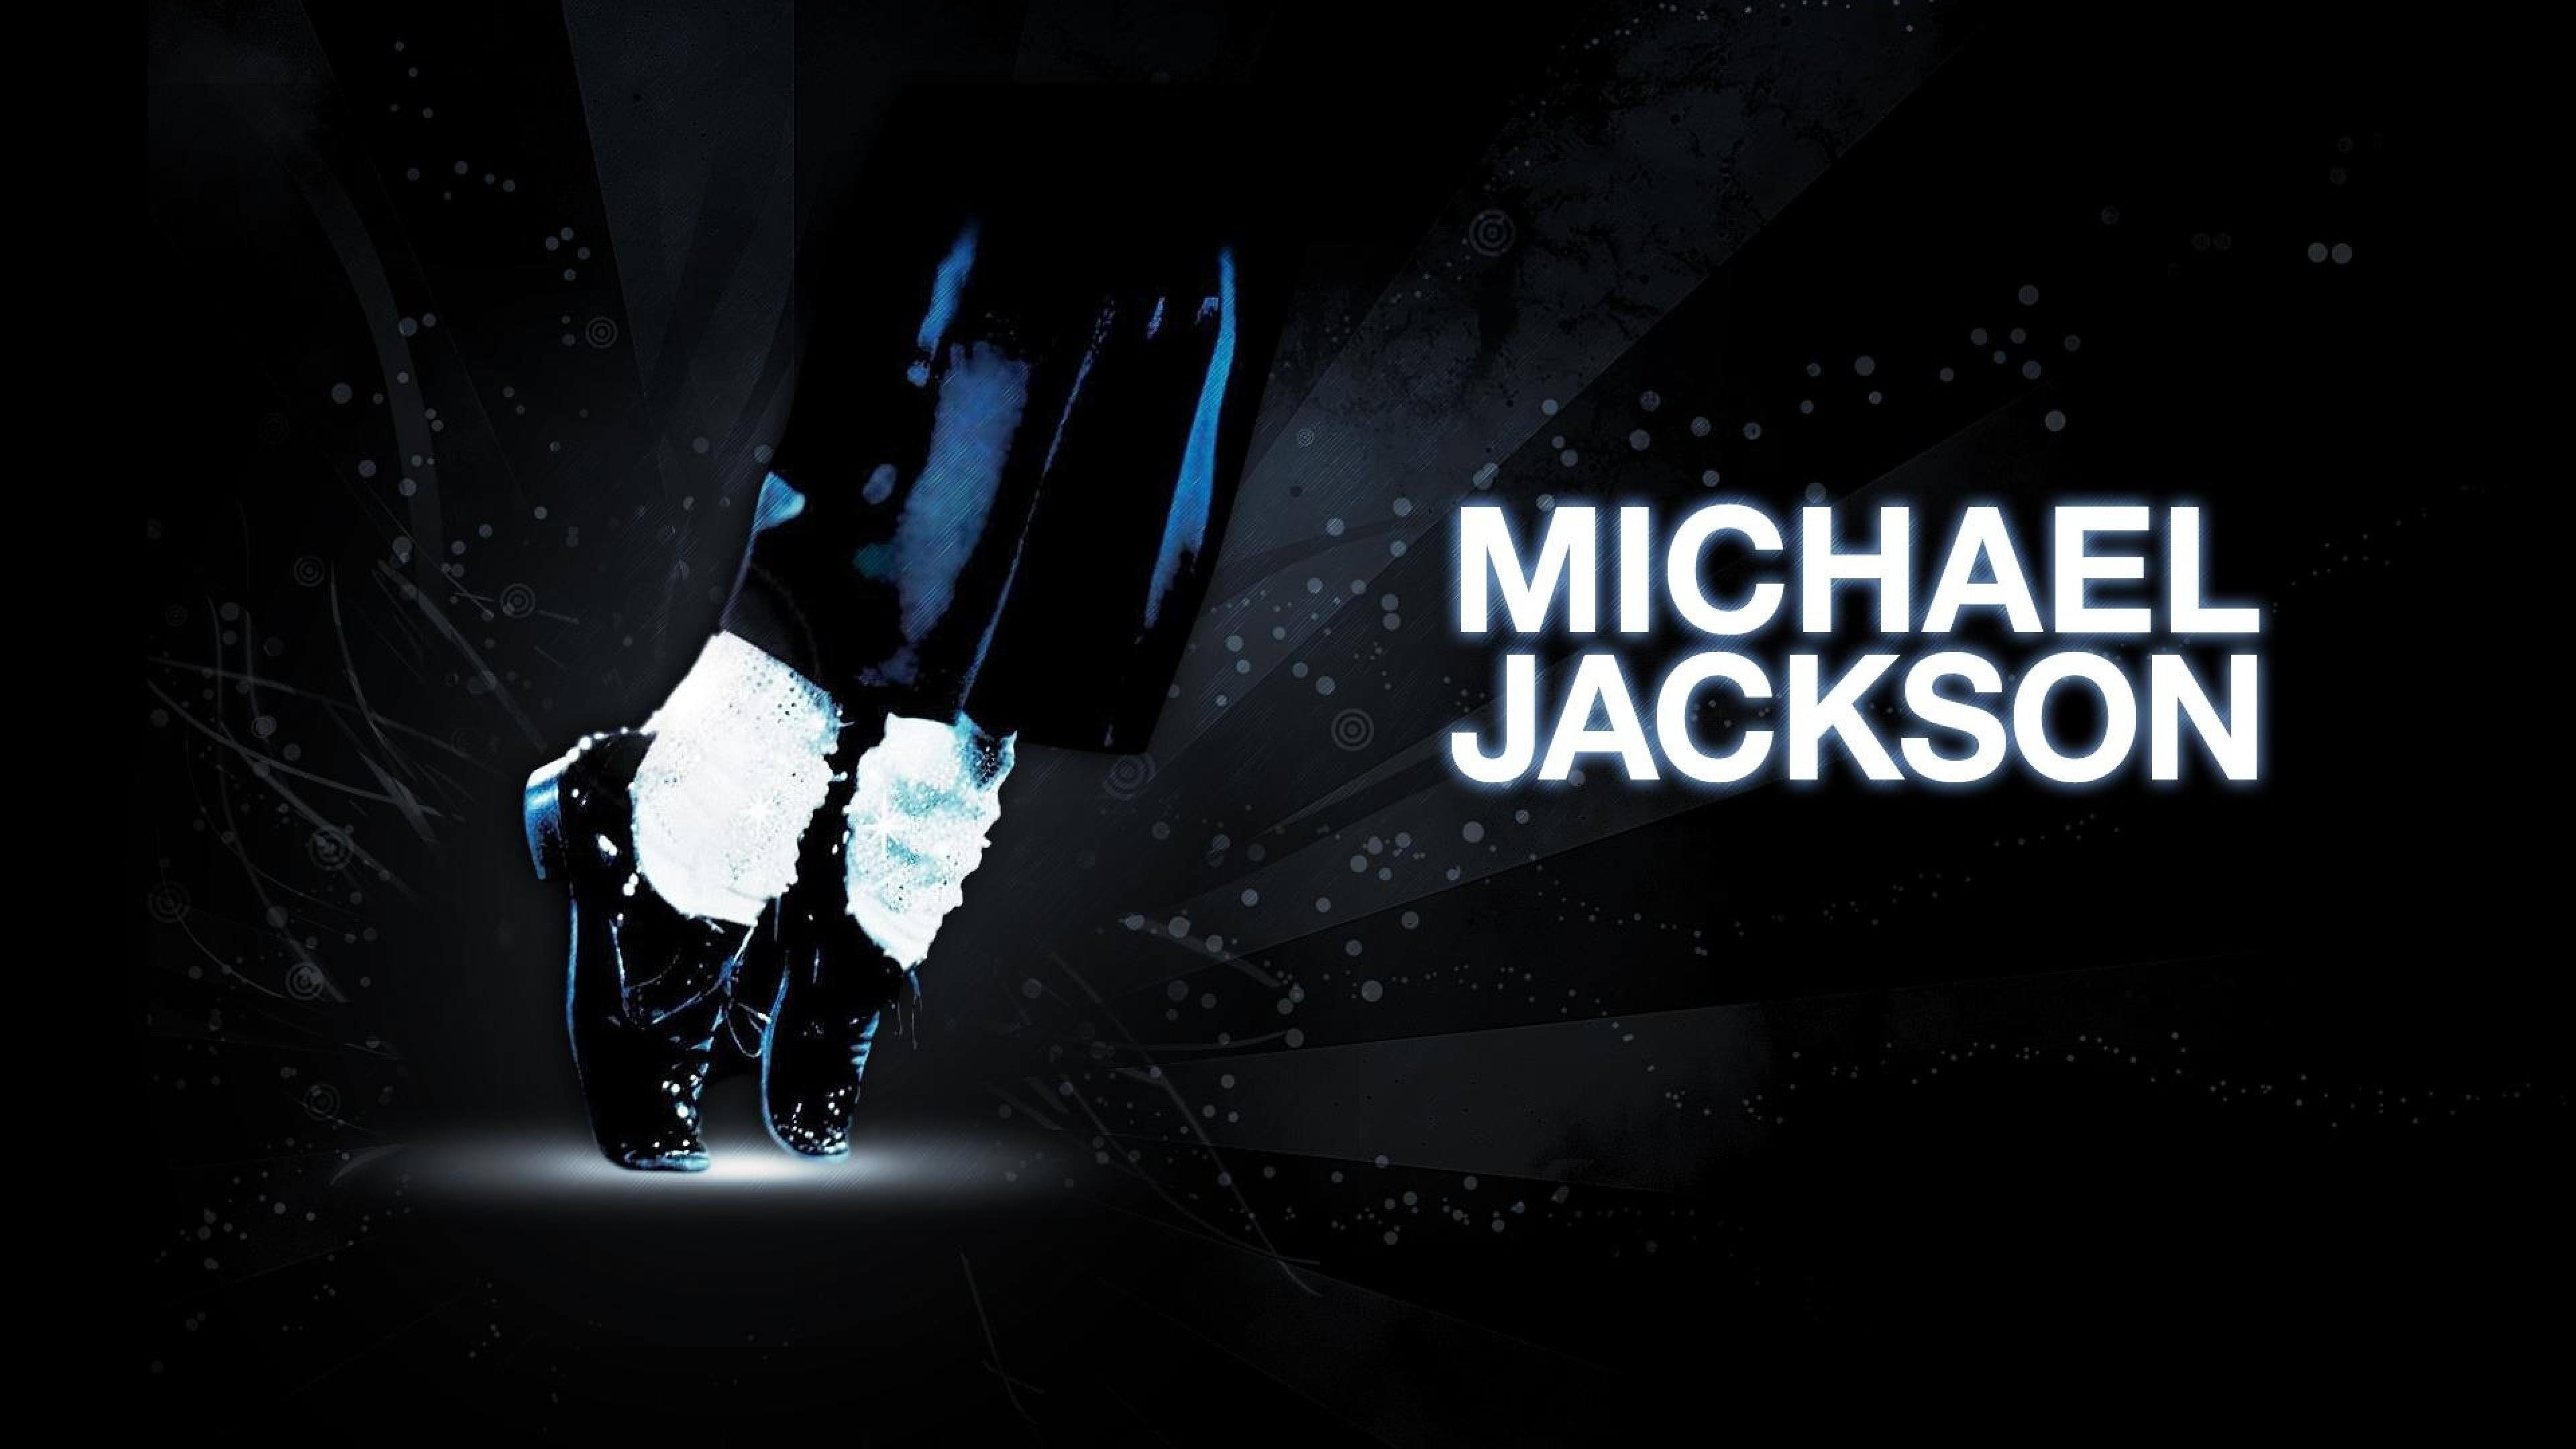 Michael Jackson Wallpaper 85 Images